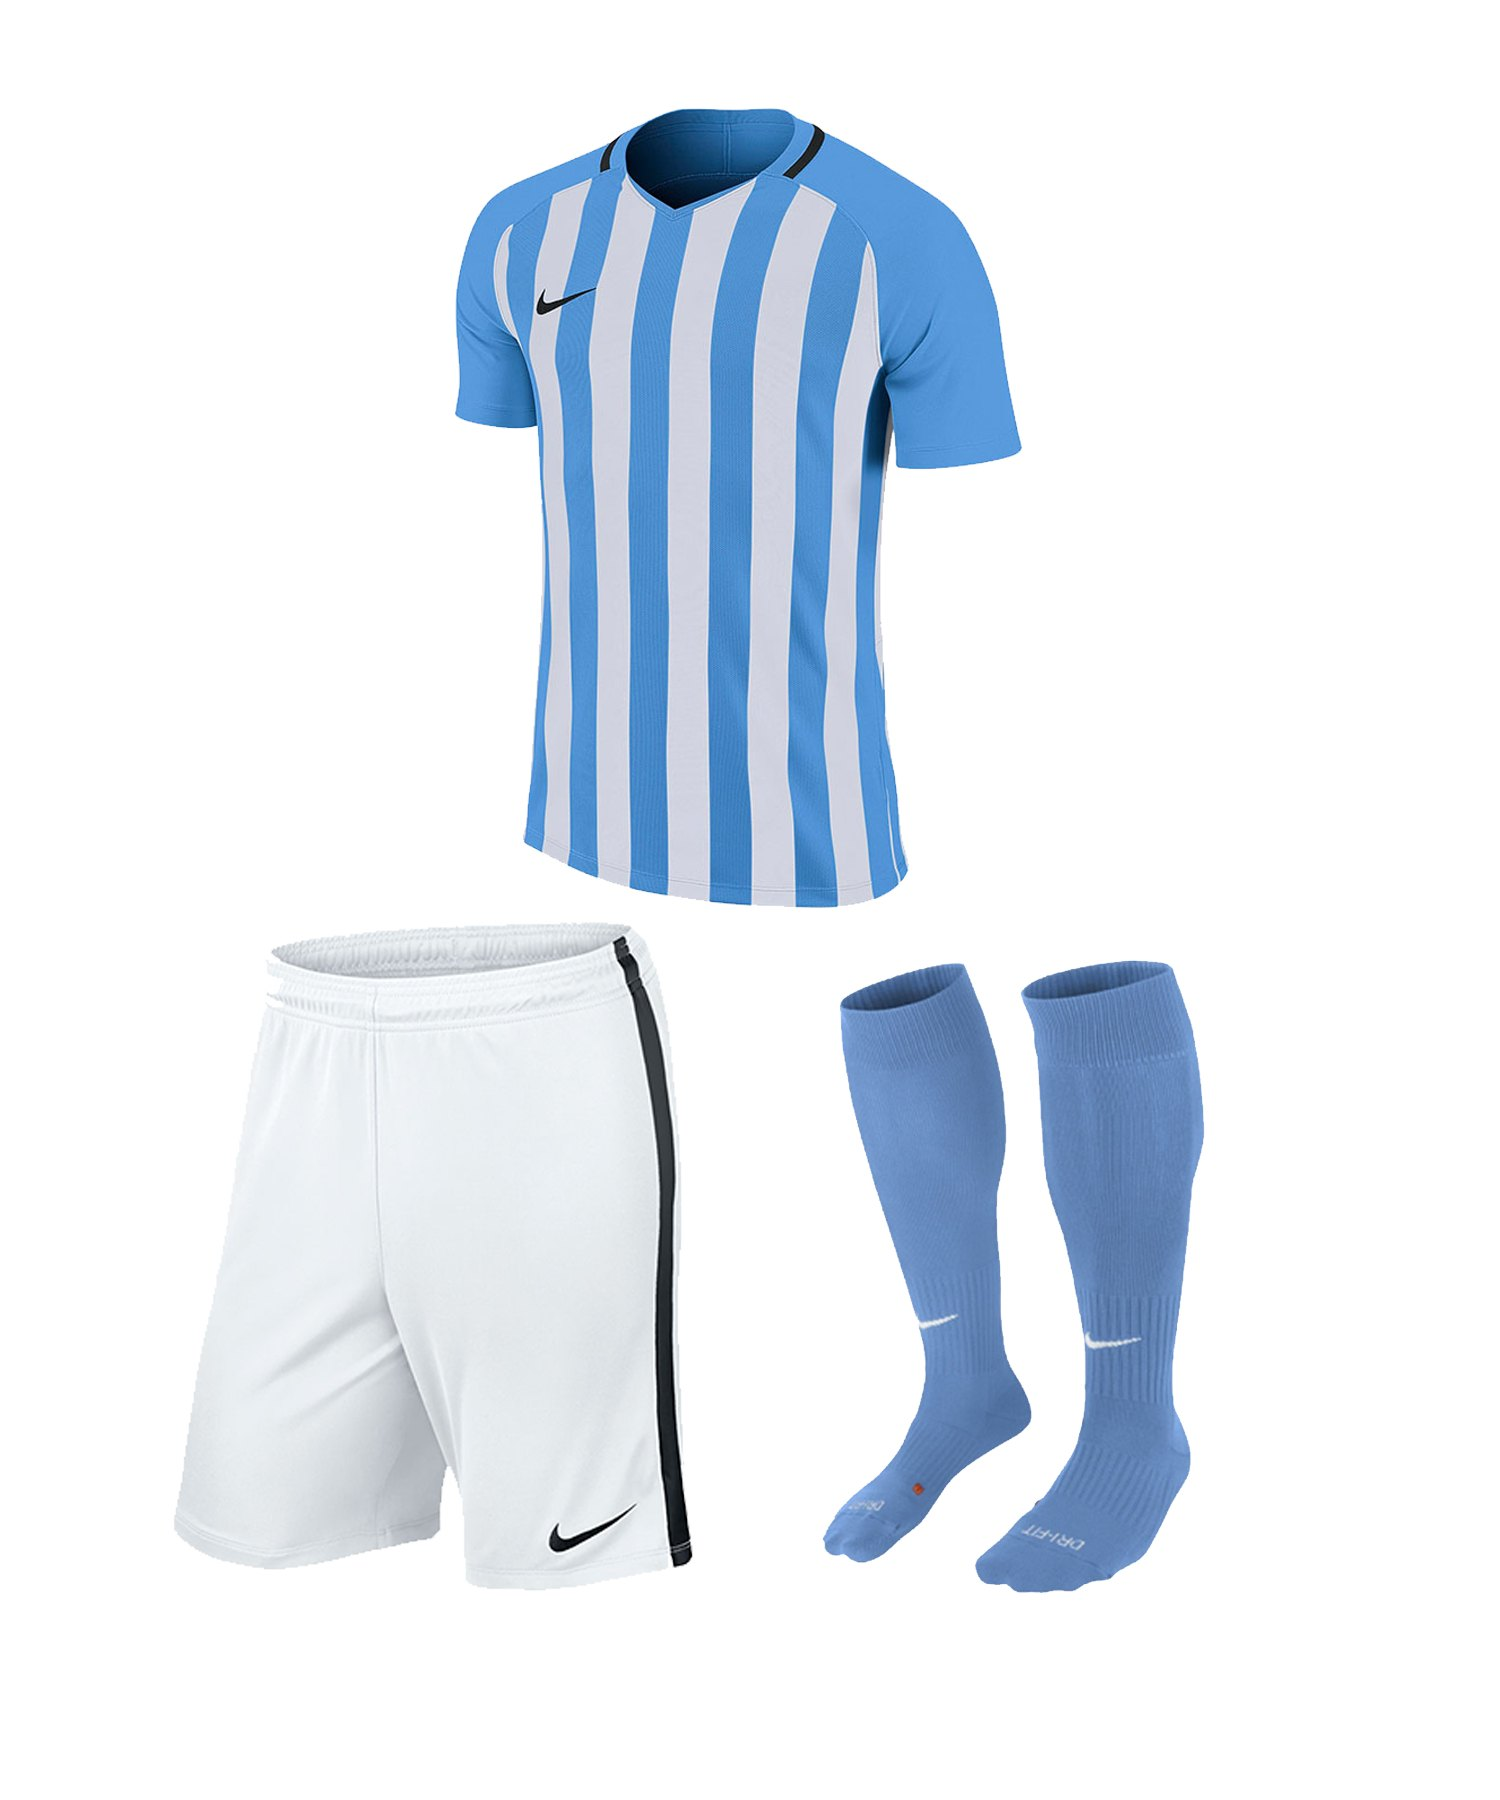 Nike Striped Division III Trikotset kurz Kids F412 - blau